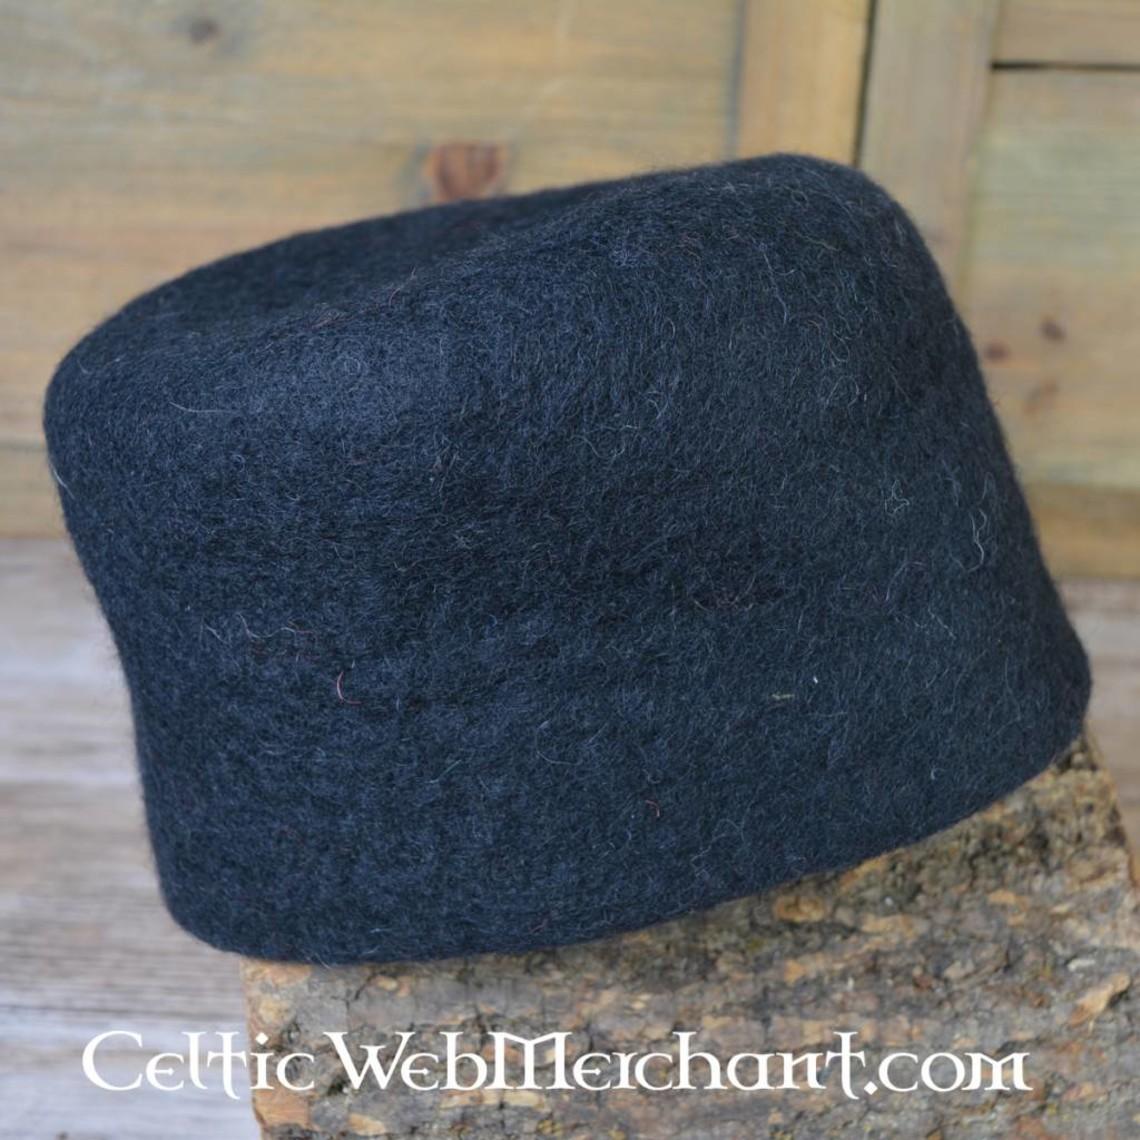 Leonardo Carbone siglo 15 sombrero de fieltro Durero, negro